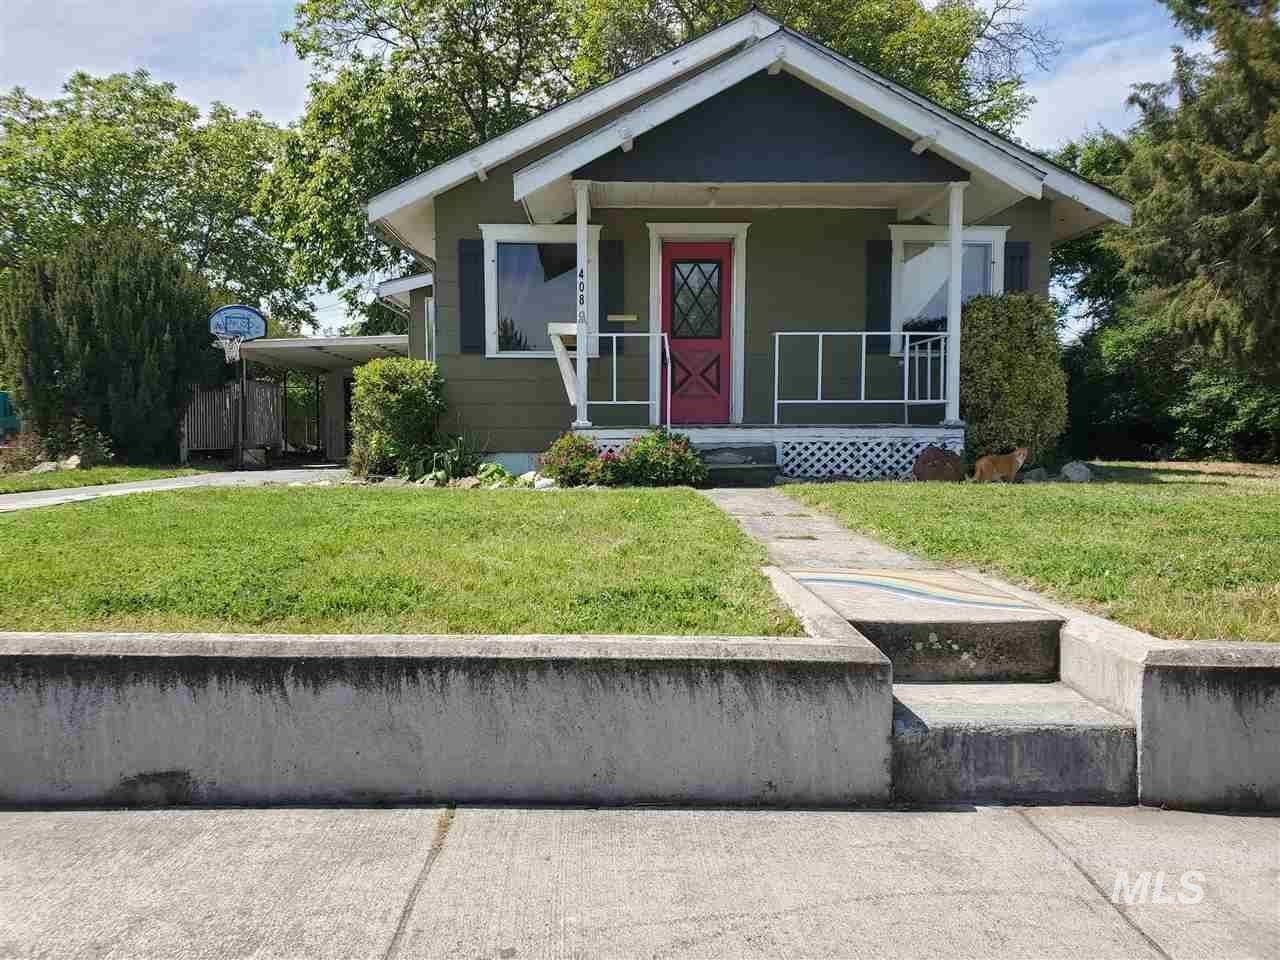 Photo of 408 12th Street, Clarkston, WA 99403 (MLS # 98765914)